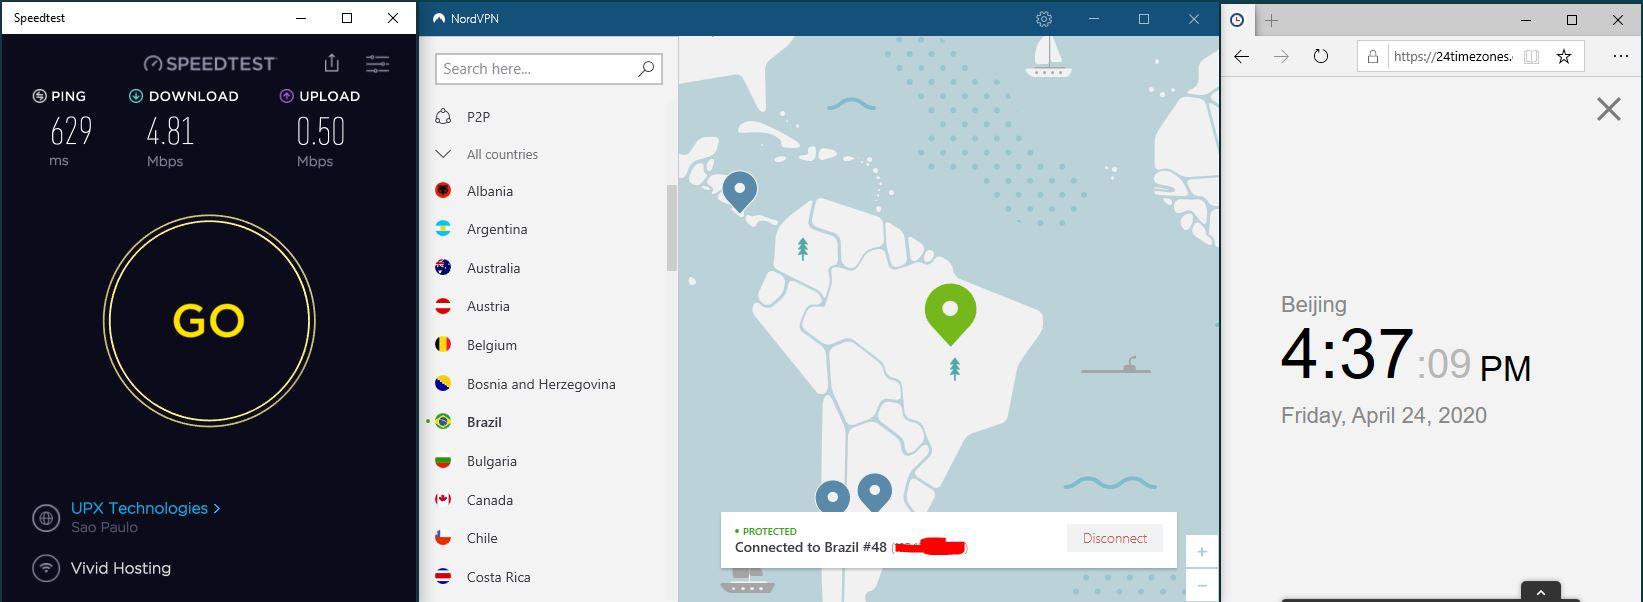 Windows10 NordVPN Brazil #48 中国VPN 翻墙 科学上网 SpeedTest测速-20200424